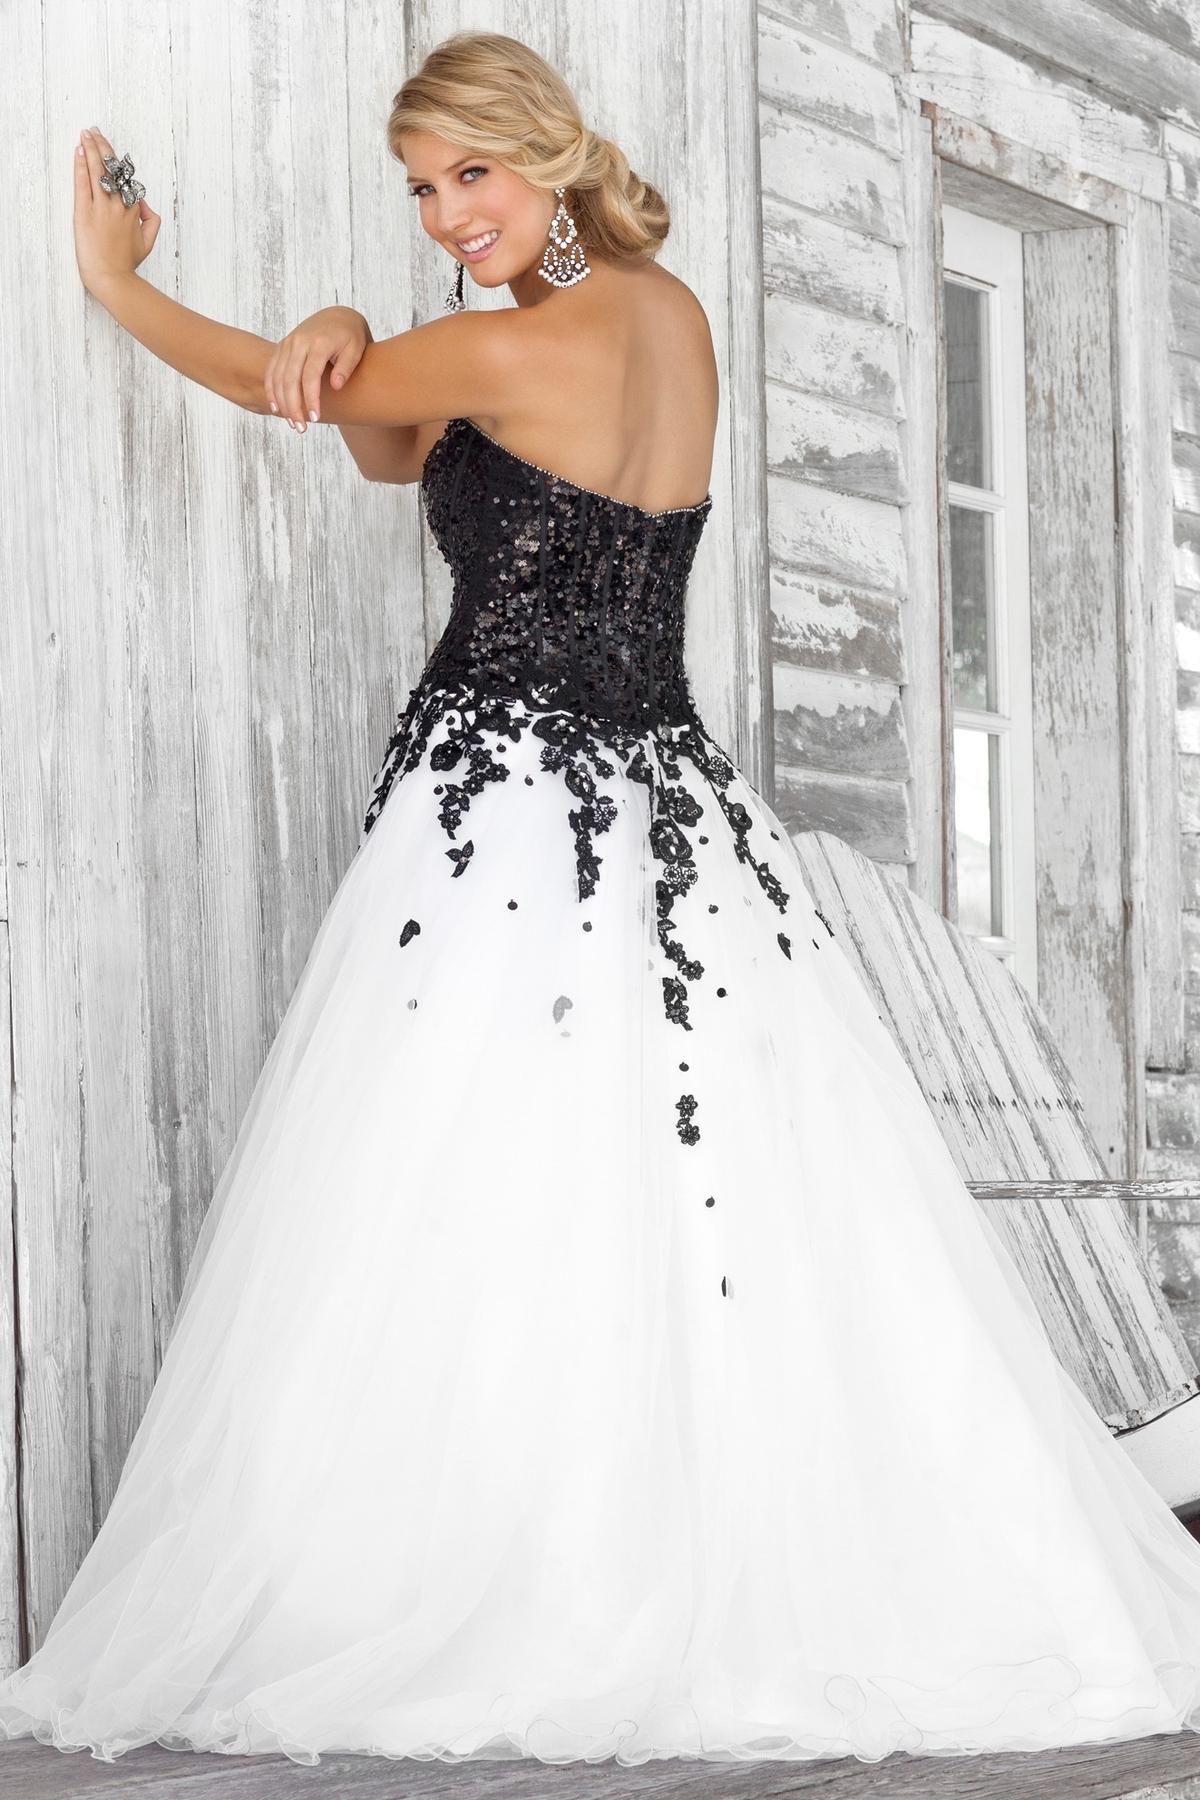 plus size black white wedding dresses black white wedding dress Black And White Gowns Plus Size Always In Vogue Dresses Ask